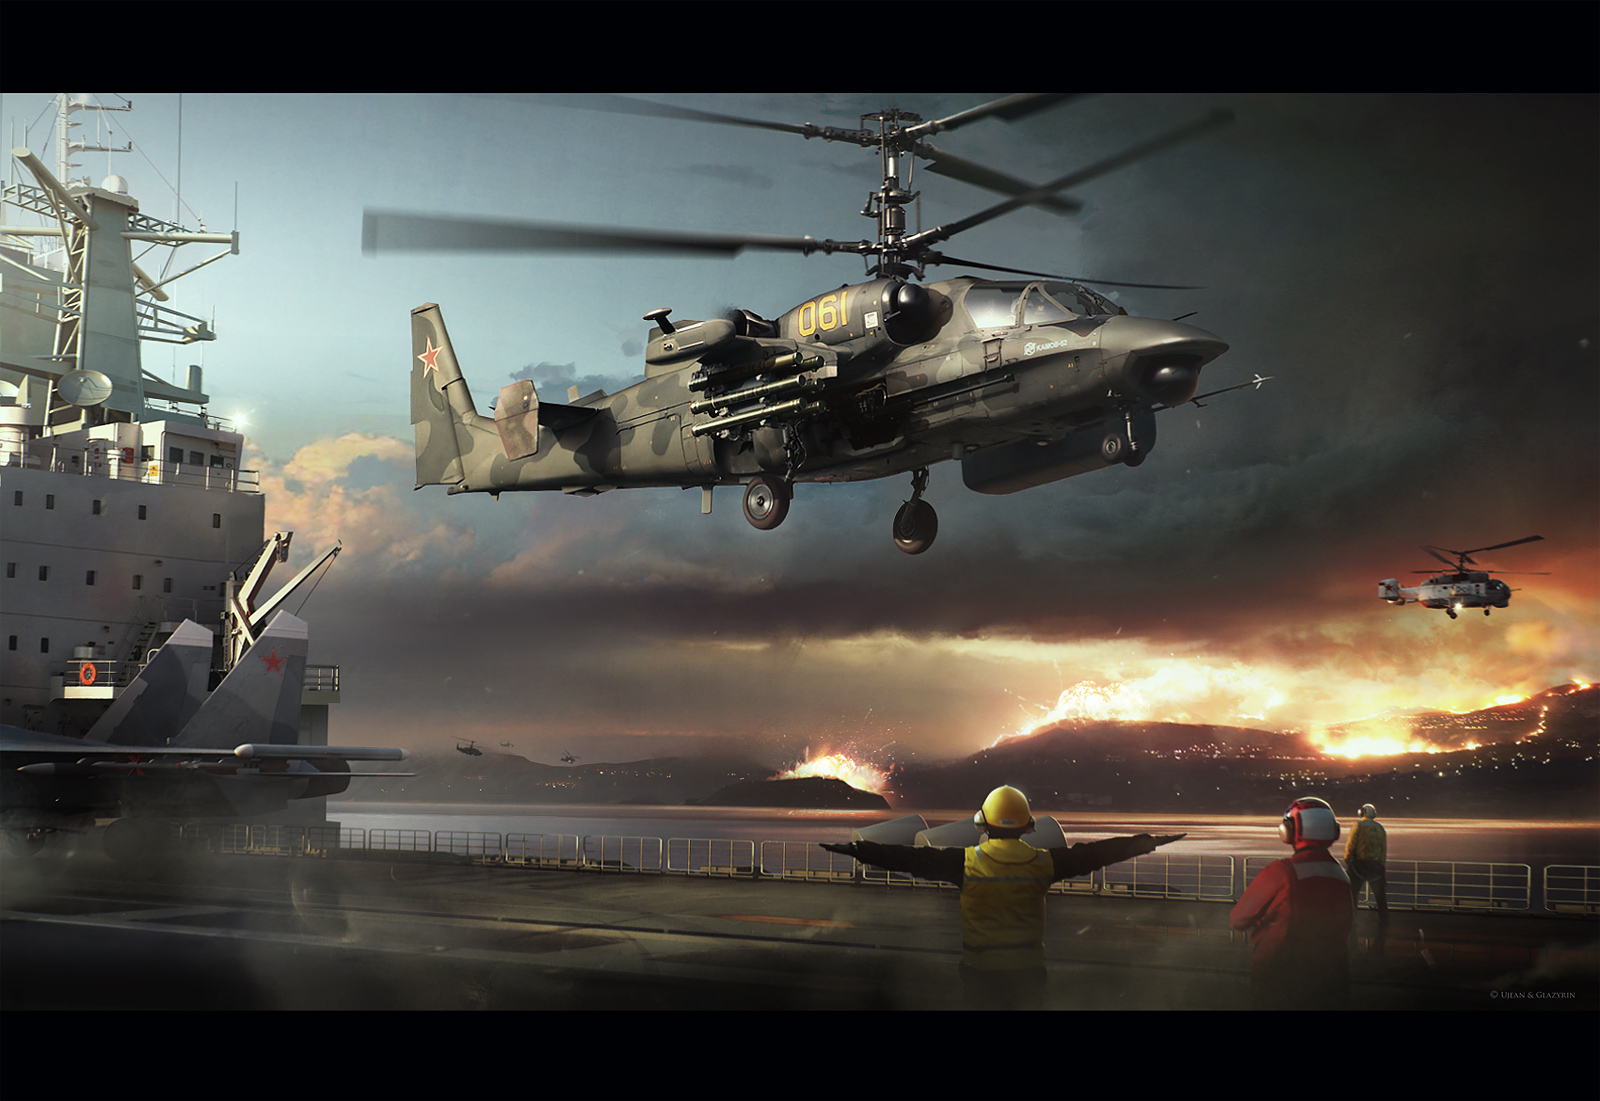 The Attack 2 by jamajurabaev